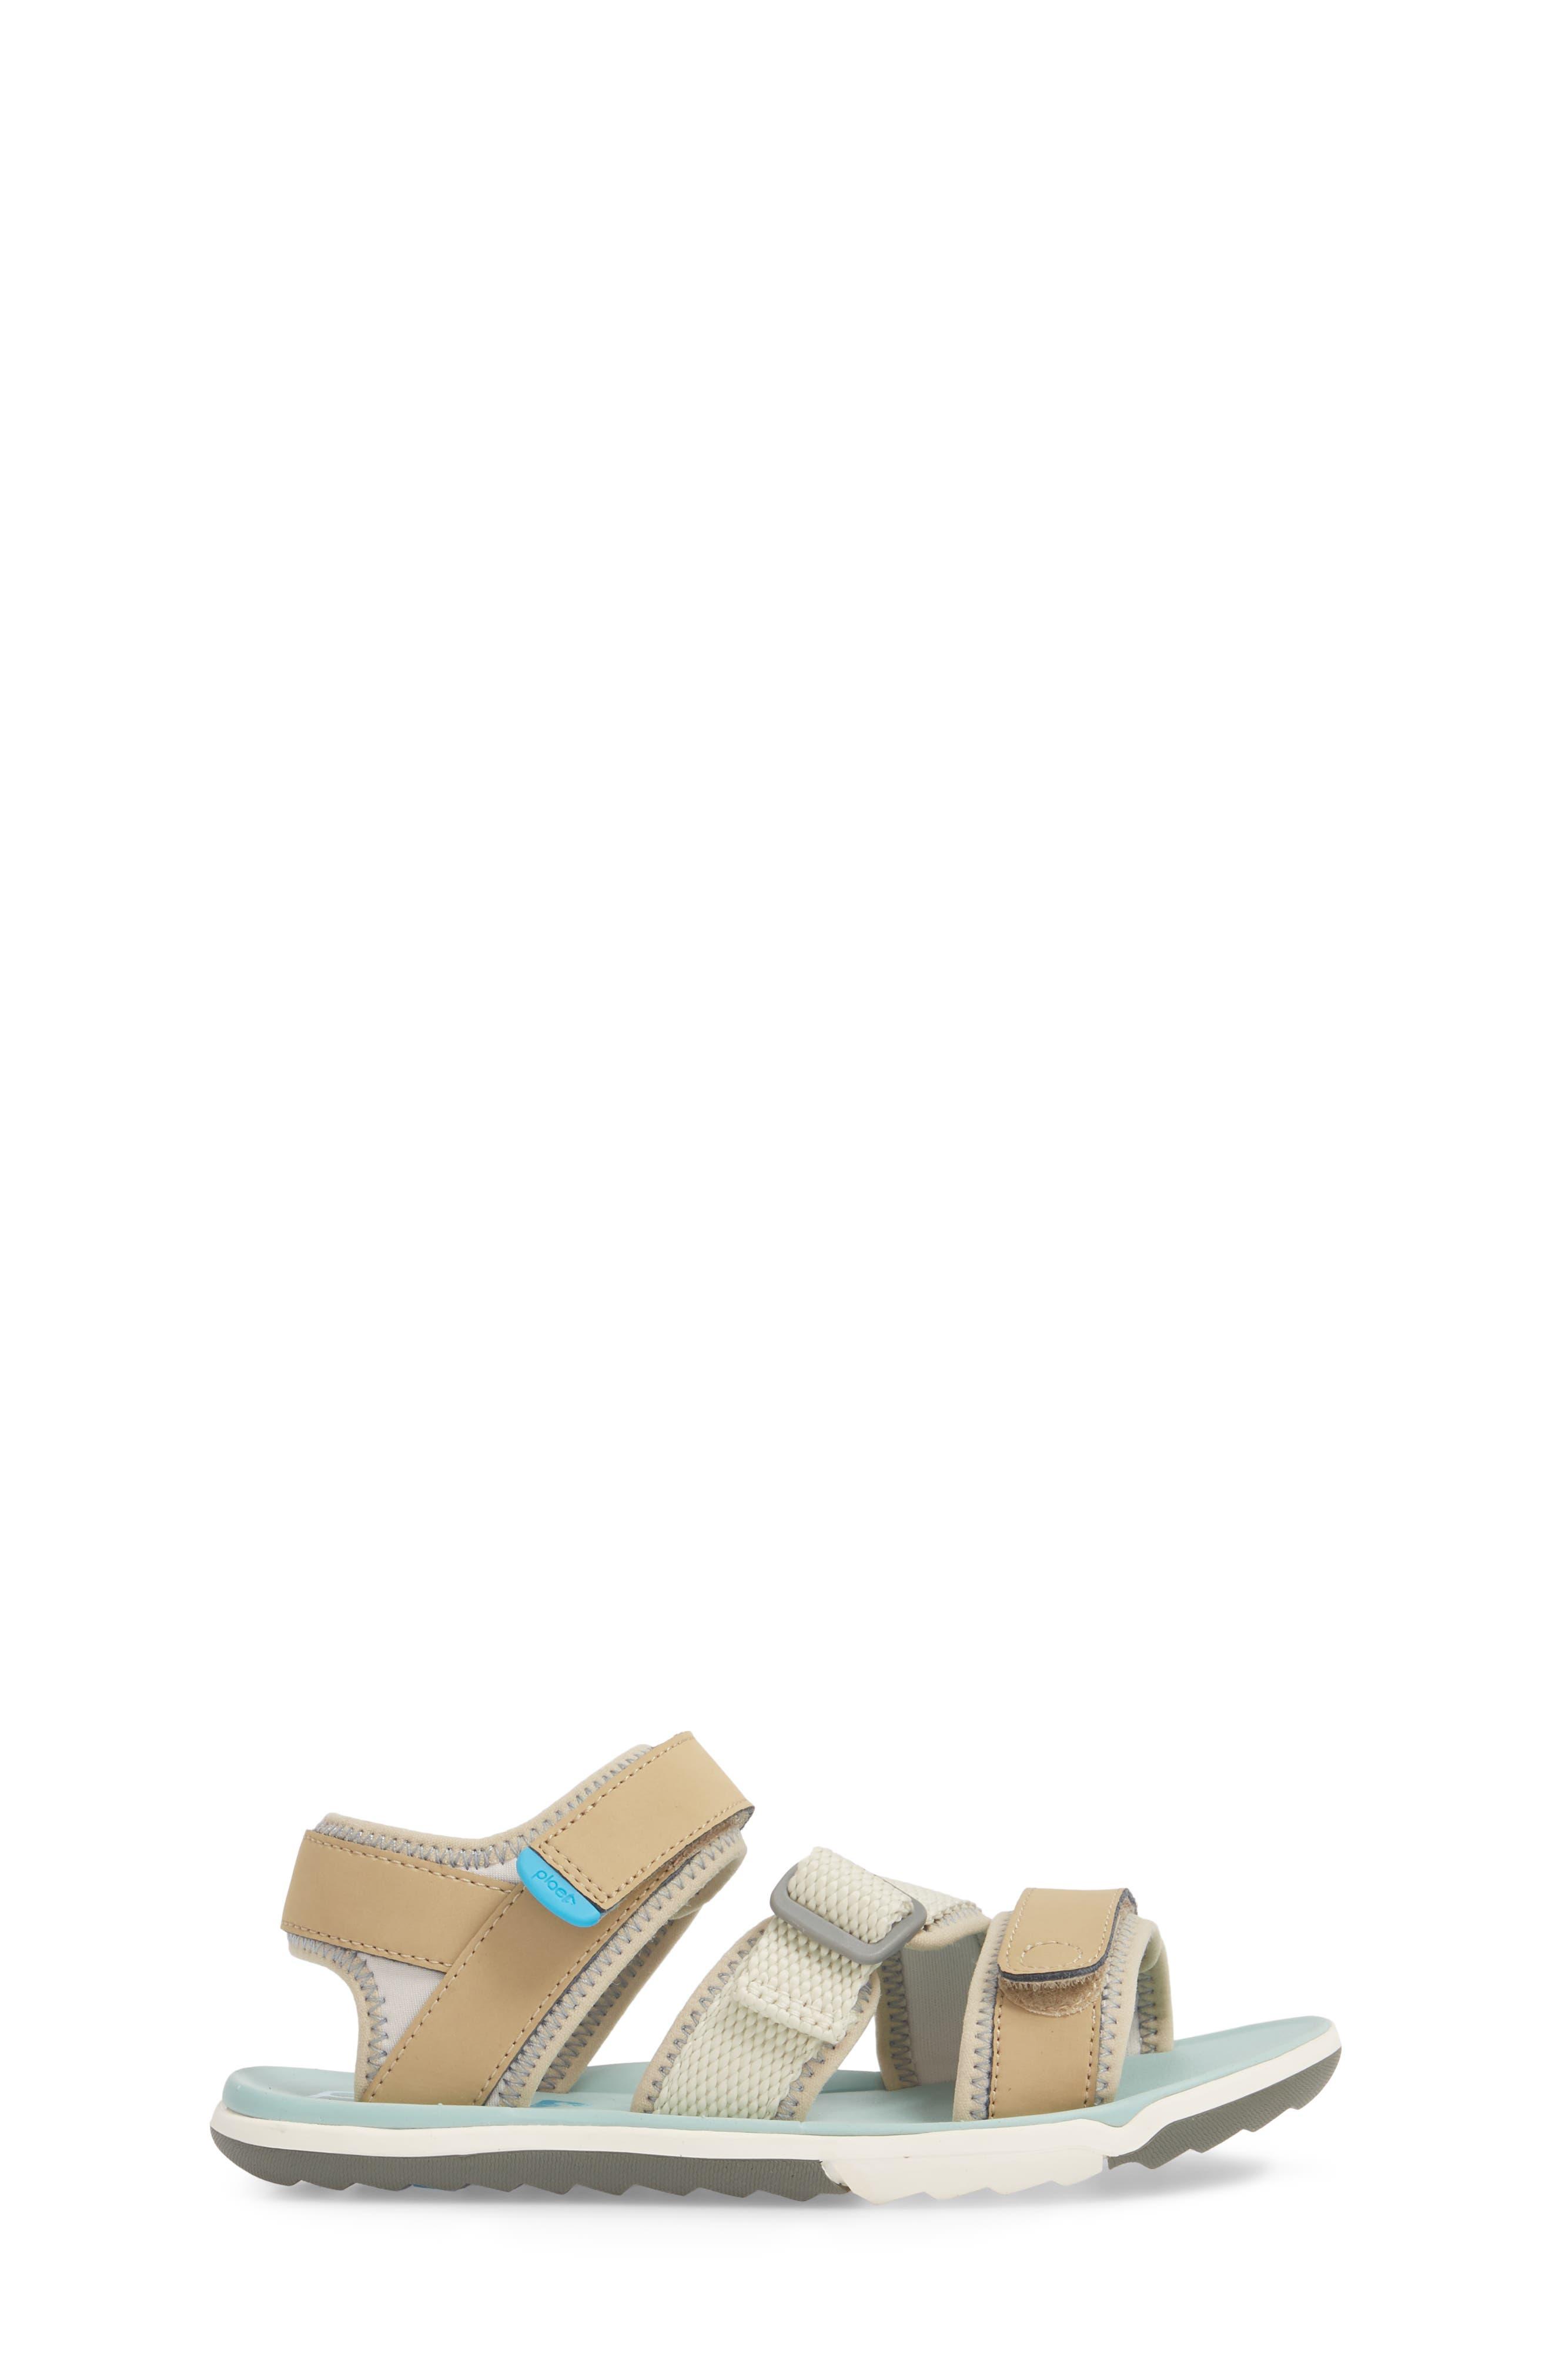 Wes Customizable Sandal,                             Alternate thumbnail 3, color,                             250